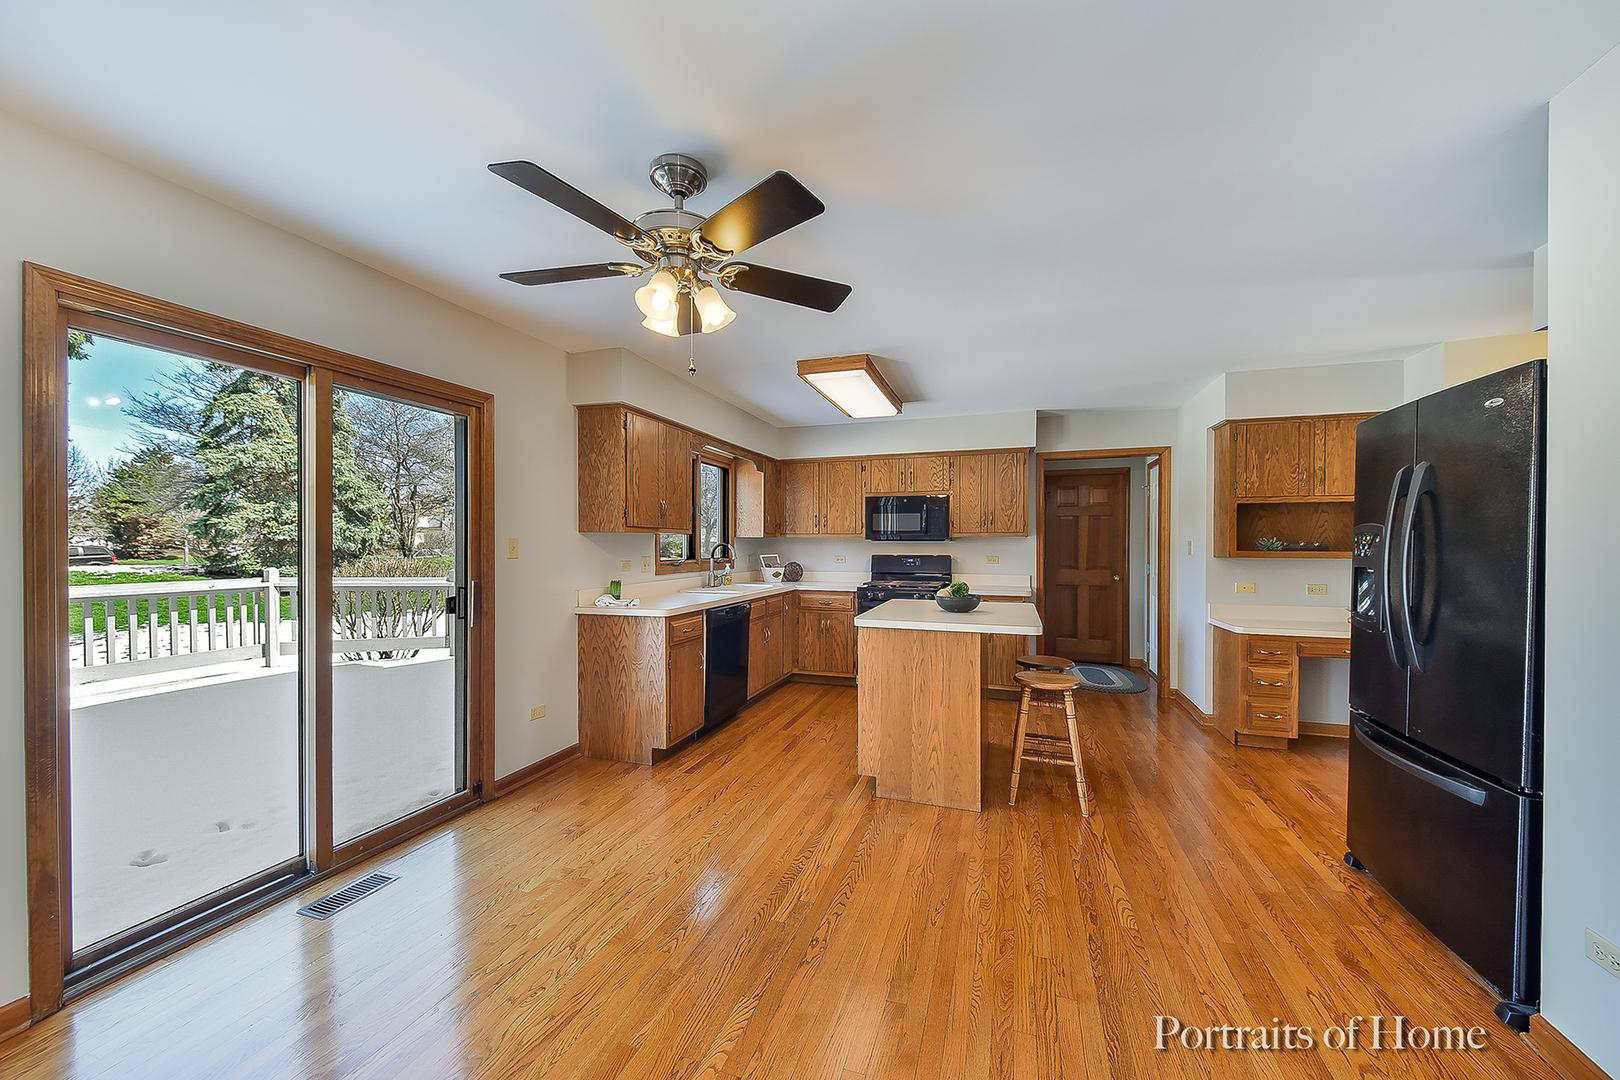 21 Breckenridge, AURORA, Illinois, 60504